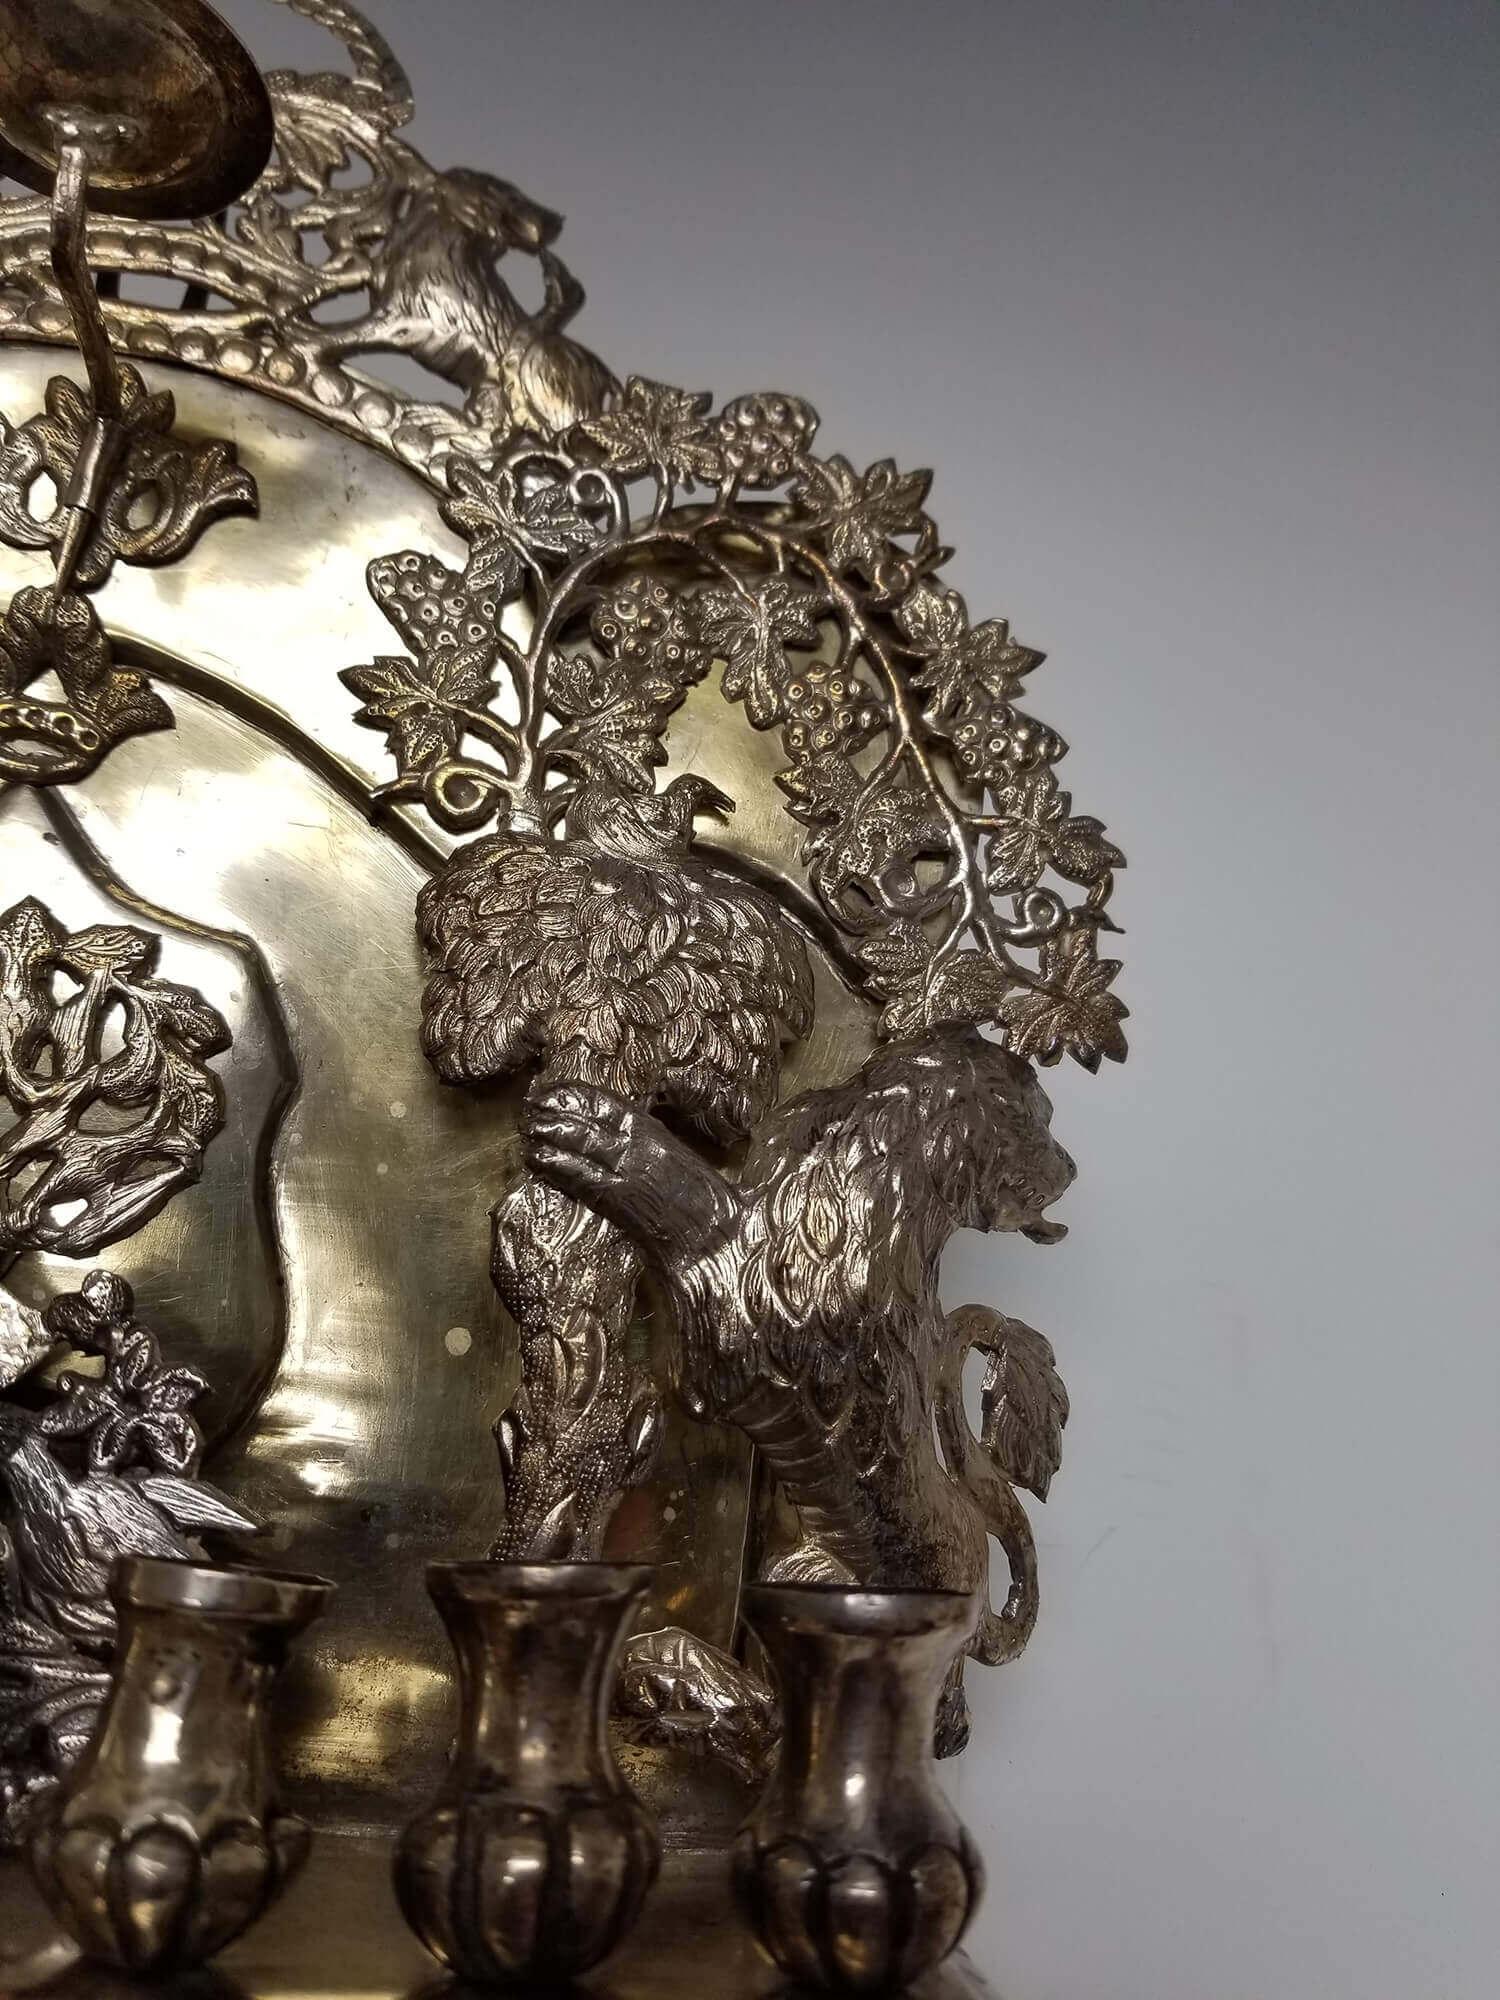 A Large Silver Hanukkah Lamp